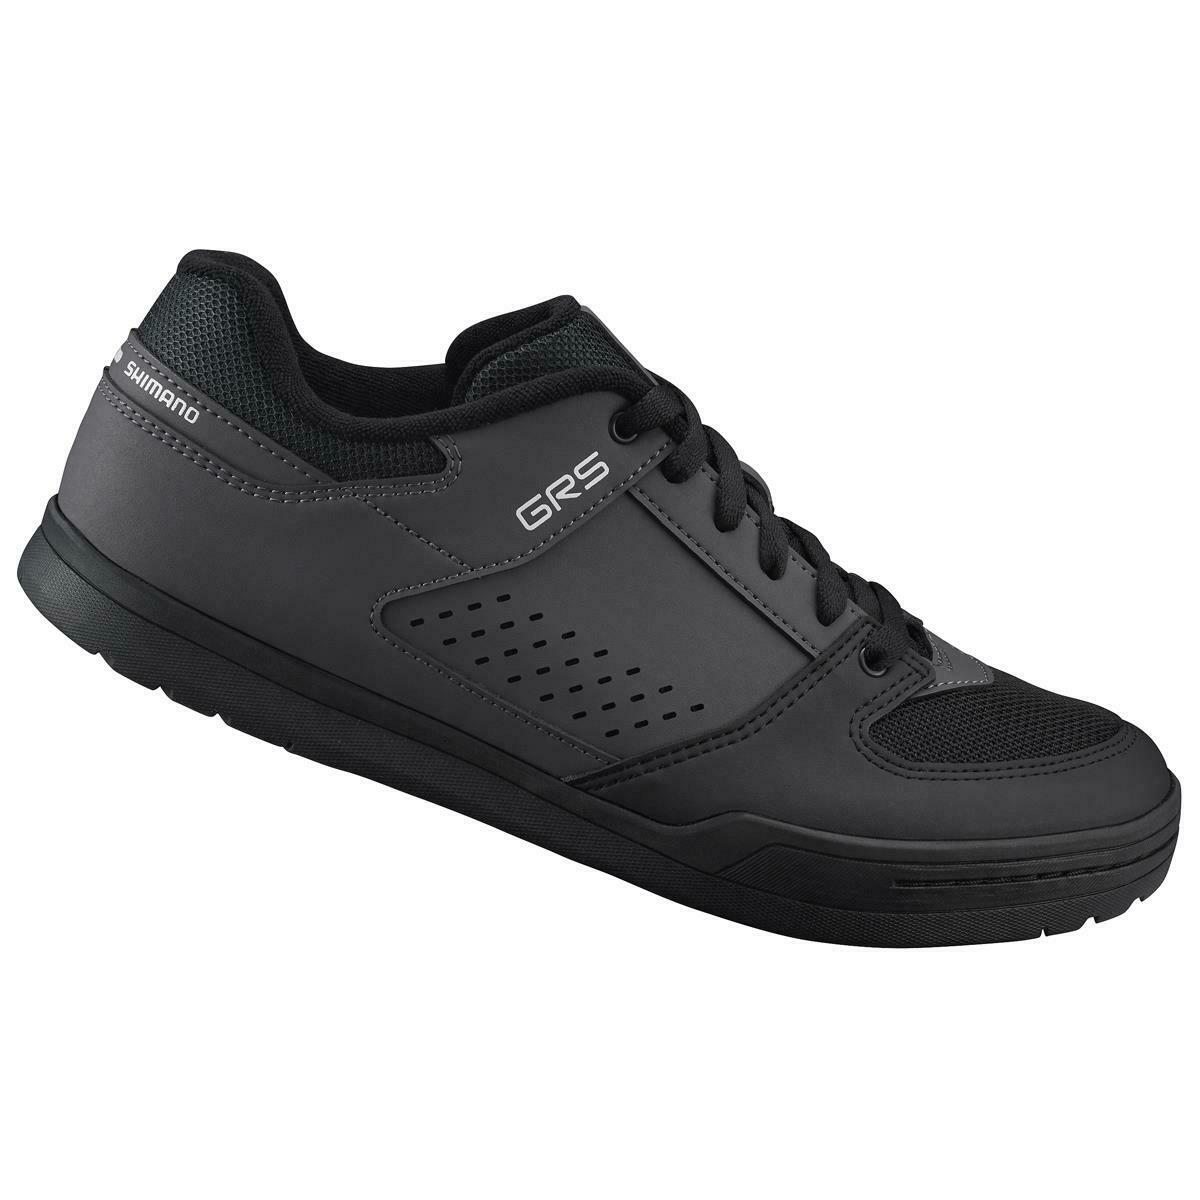 shoes flat mtb sh-gr500sg1 gr500 grey 2019 SHIMANO shoes  bike  for sale online